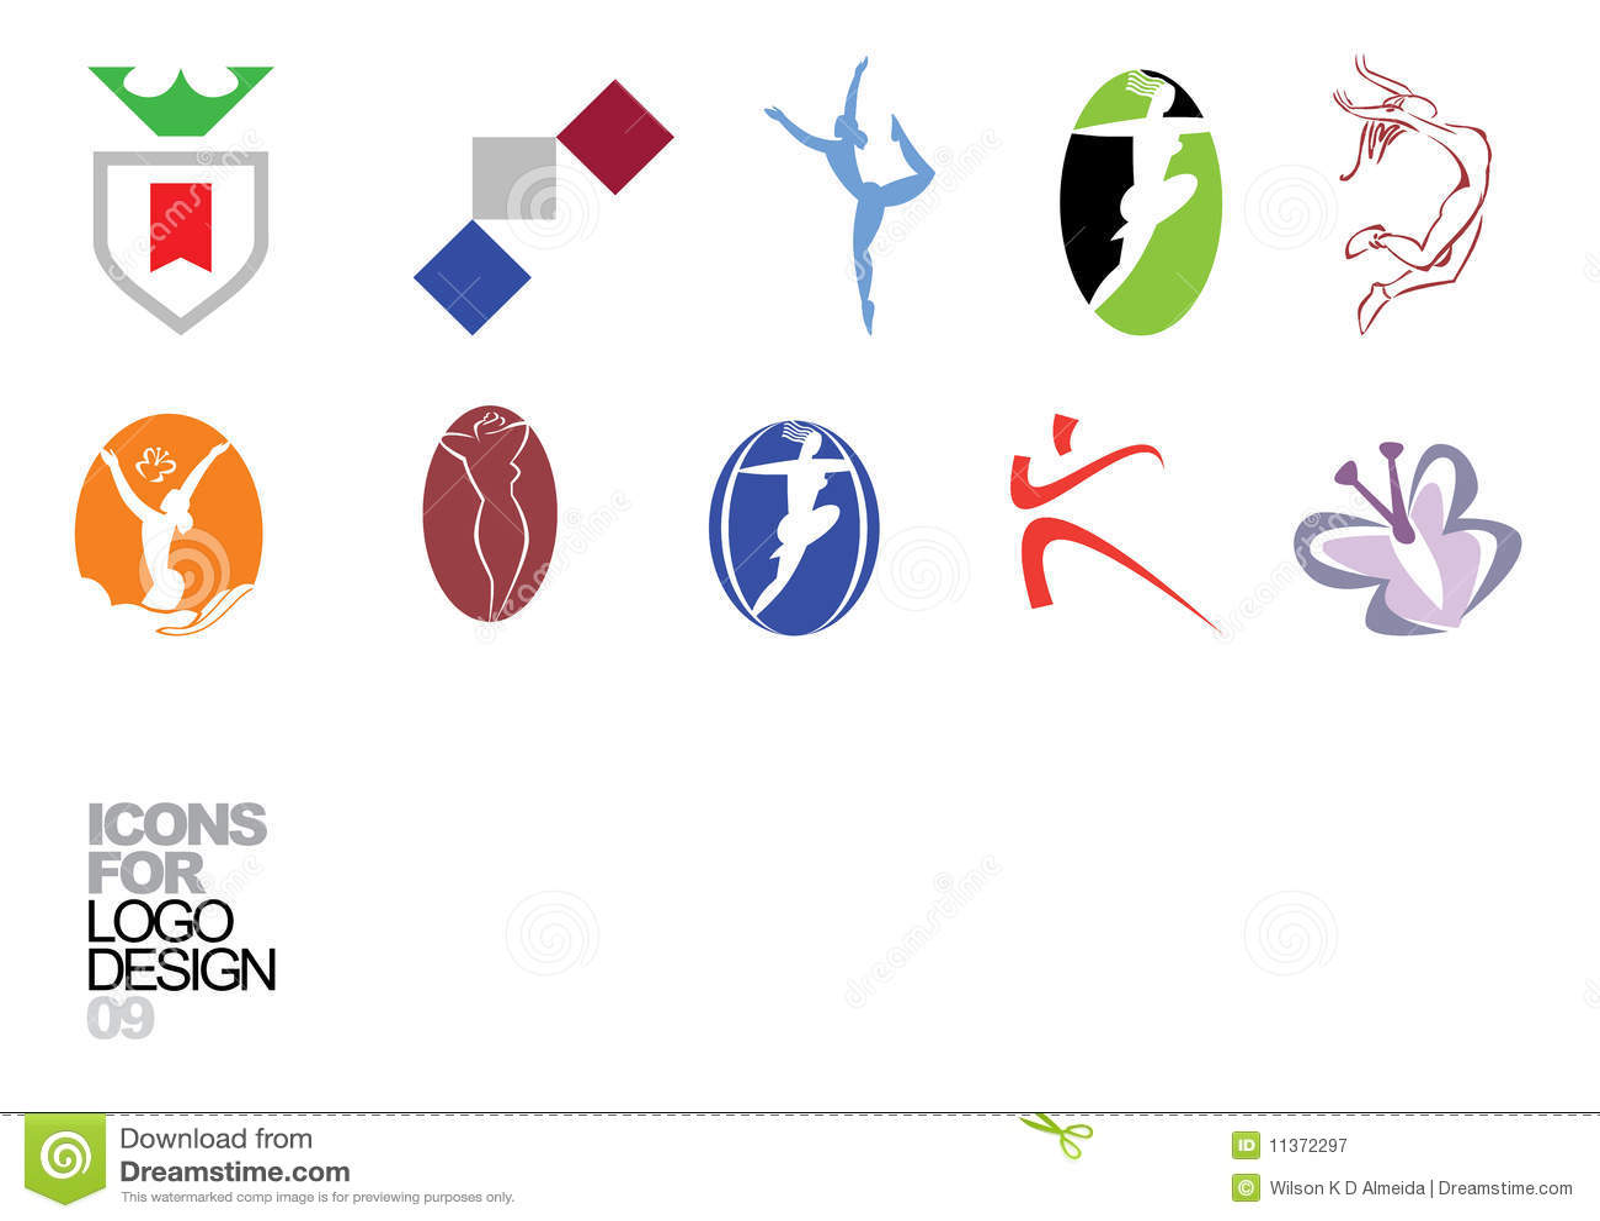 Logo design vector elements 09